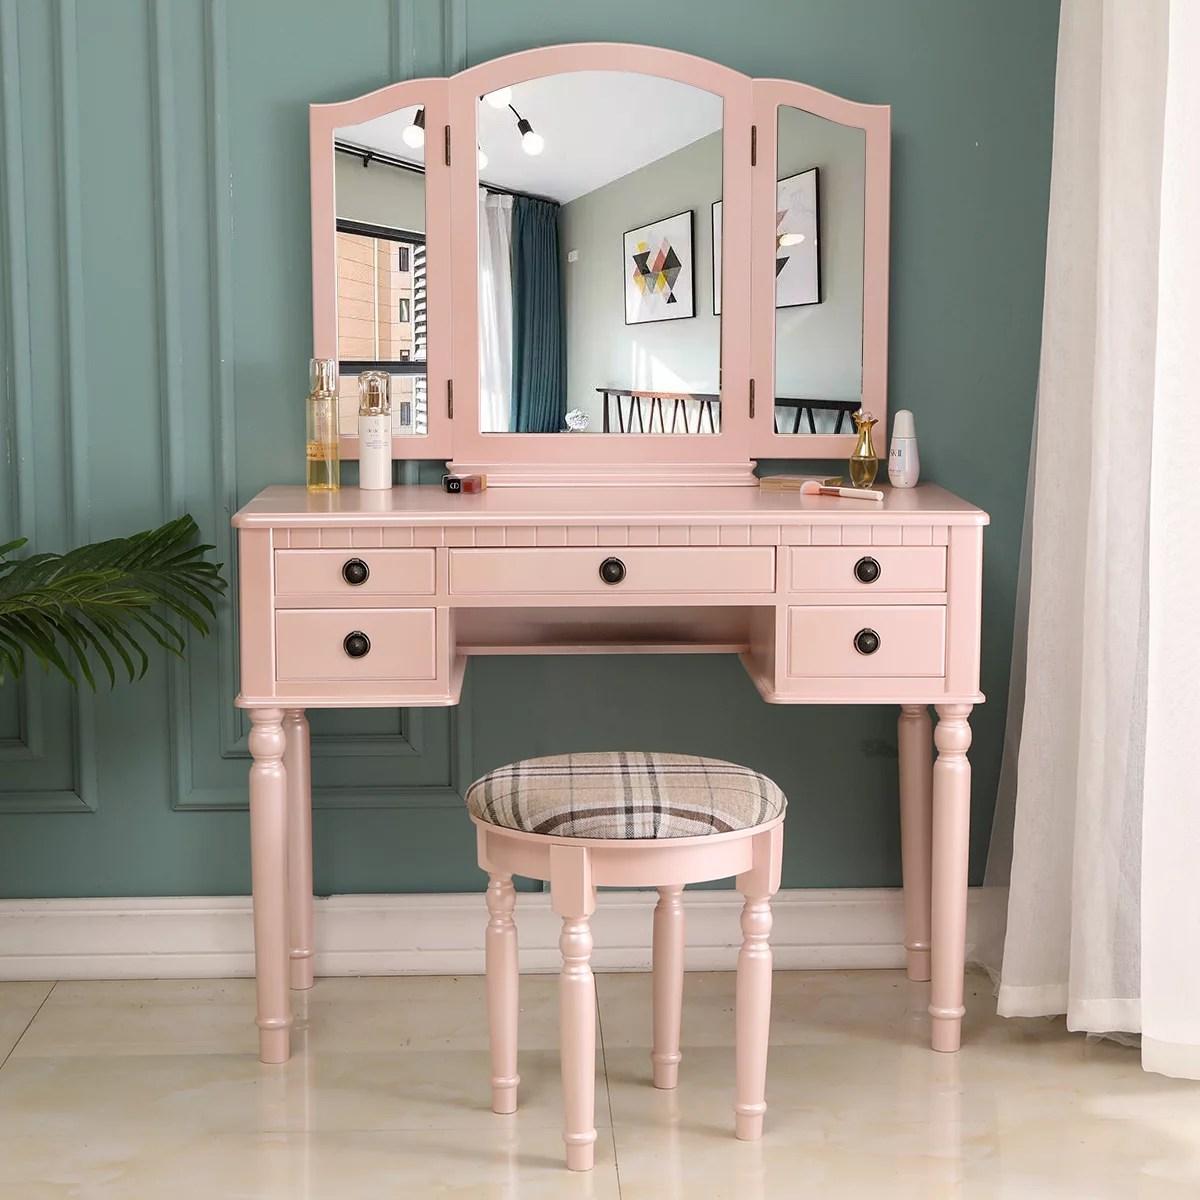 zimtown vanity makeup dressing table set w stool 5 drawer tri folding mirror jewelry wood desk furniture fluorescent pink